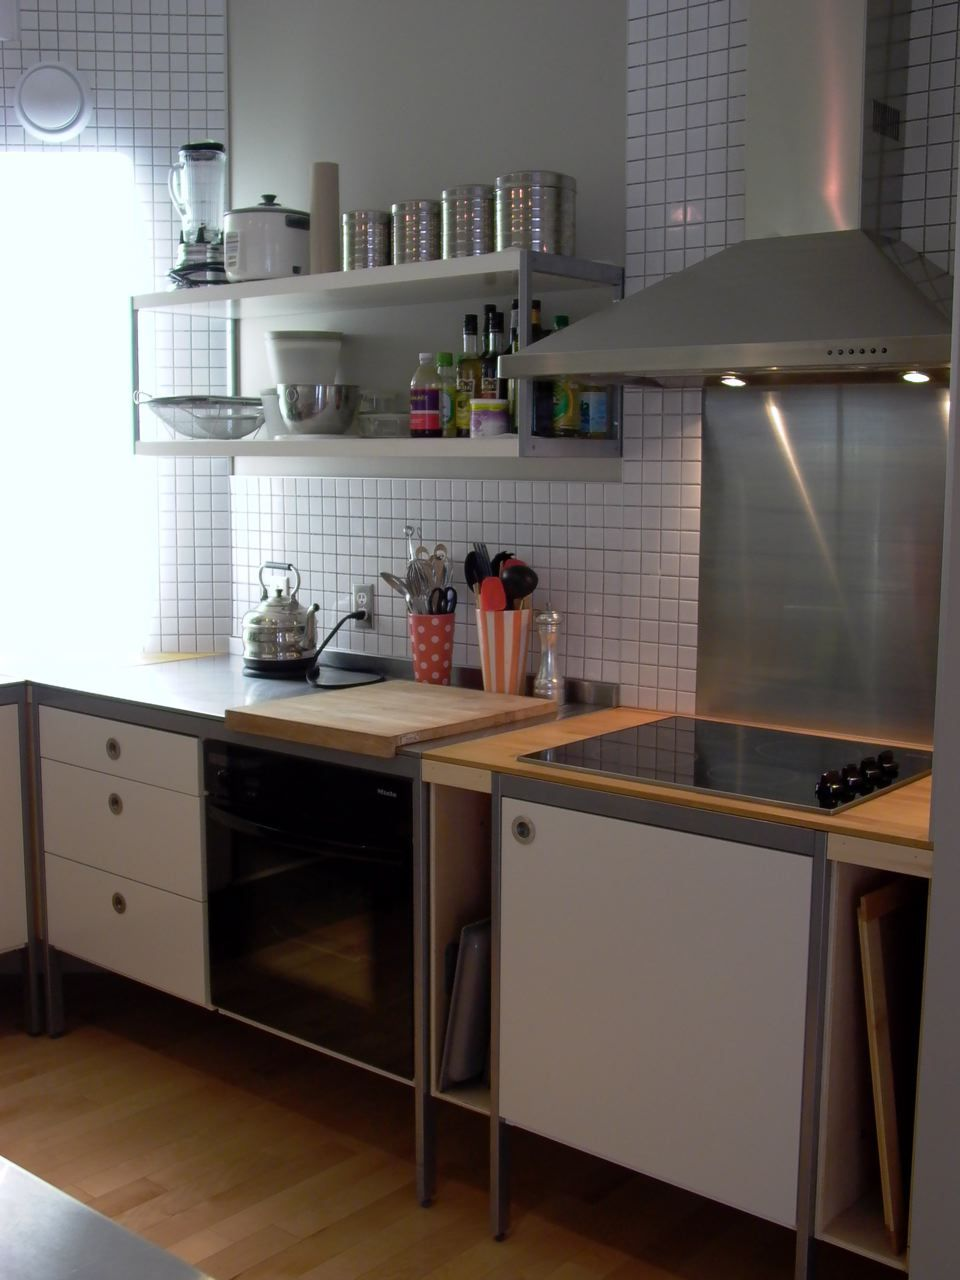 Udden Modular Kitchen Ikea Udden Ikea Ikea Hack Küche